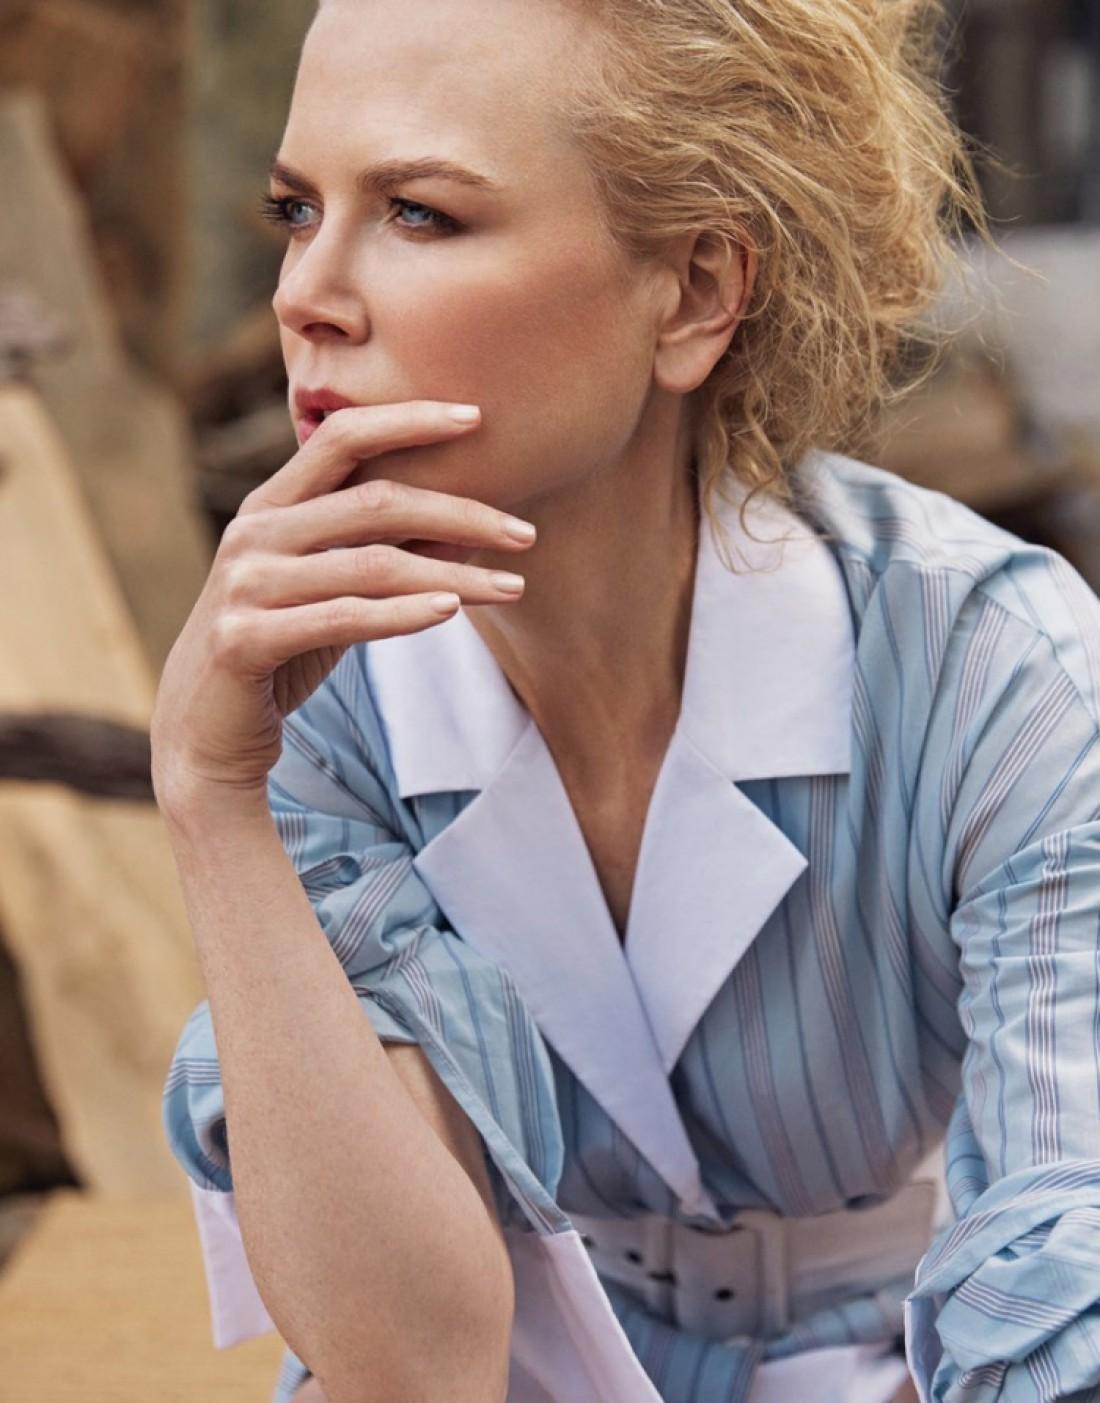 Актриса Николь Кидман в новом фотосете